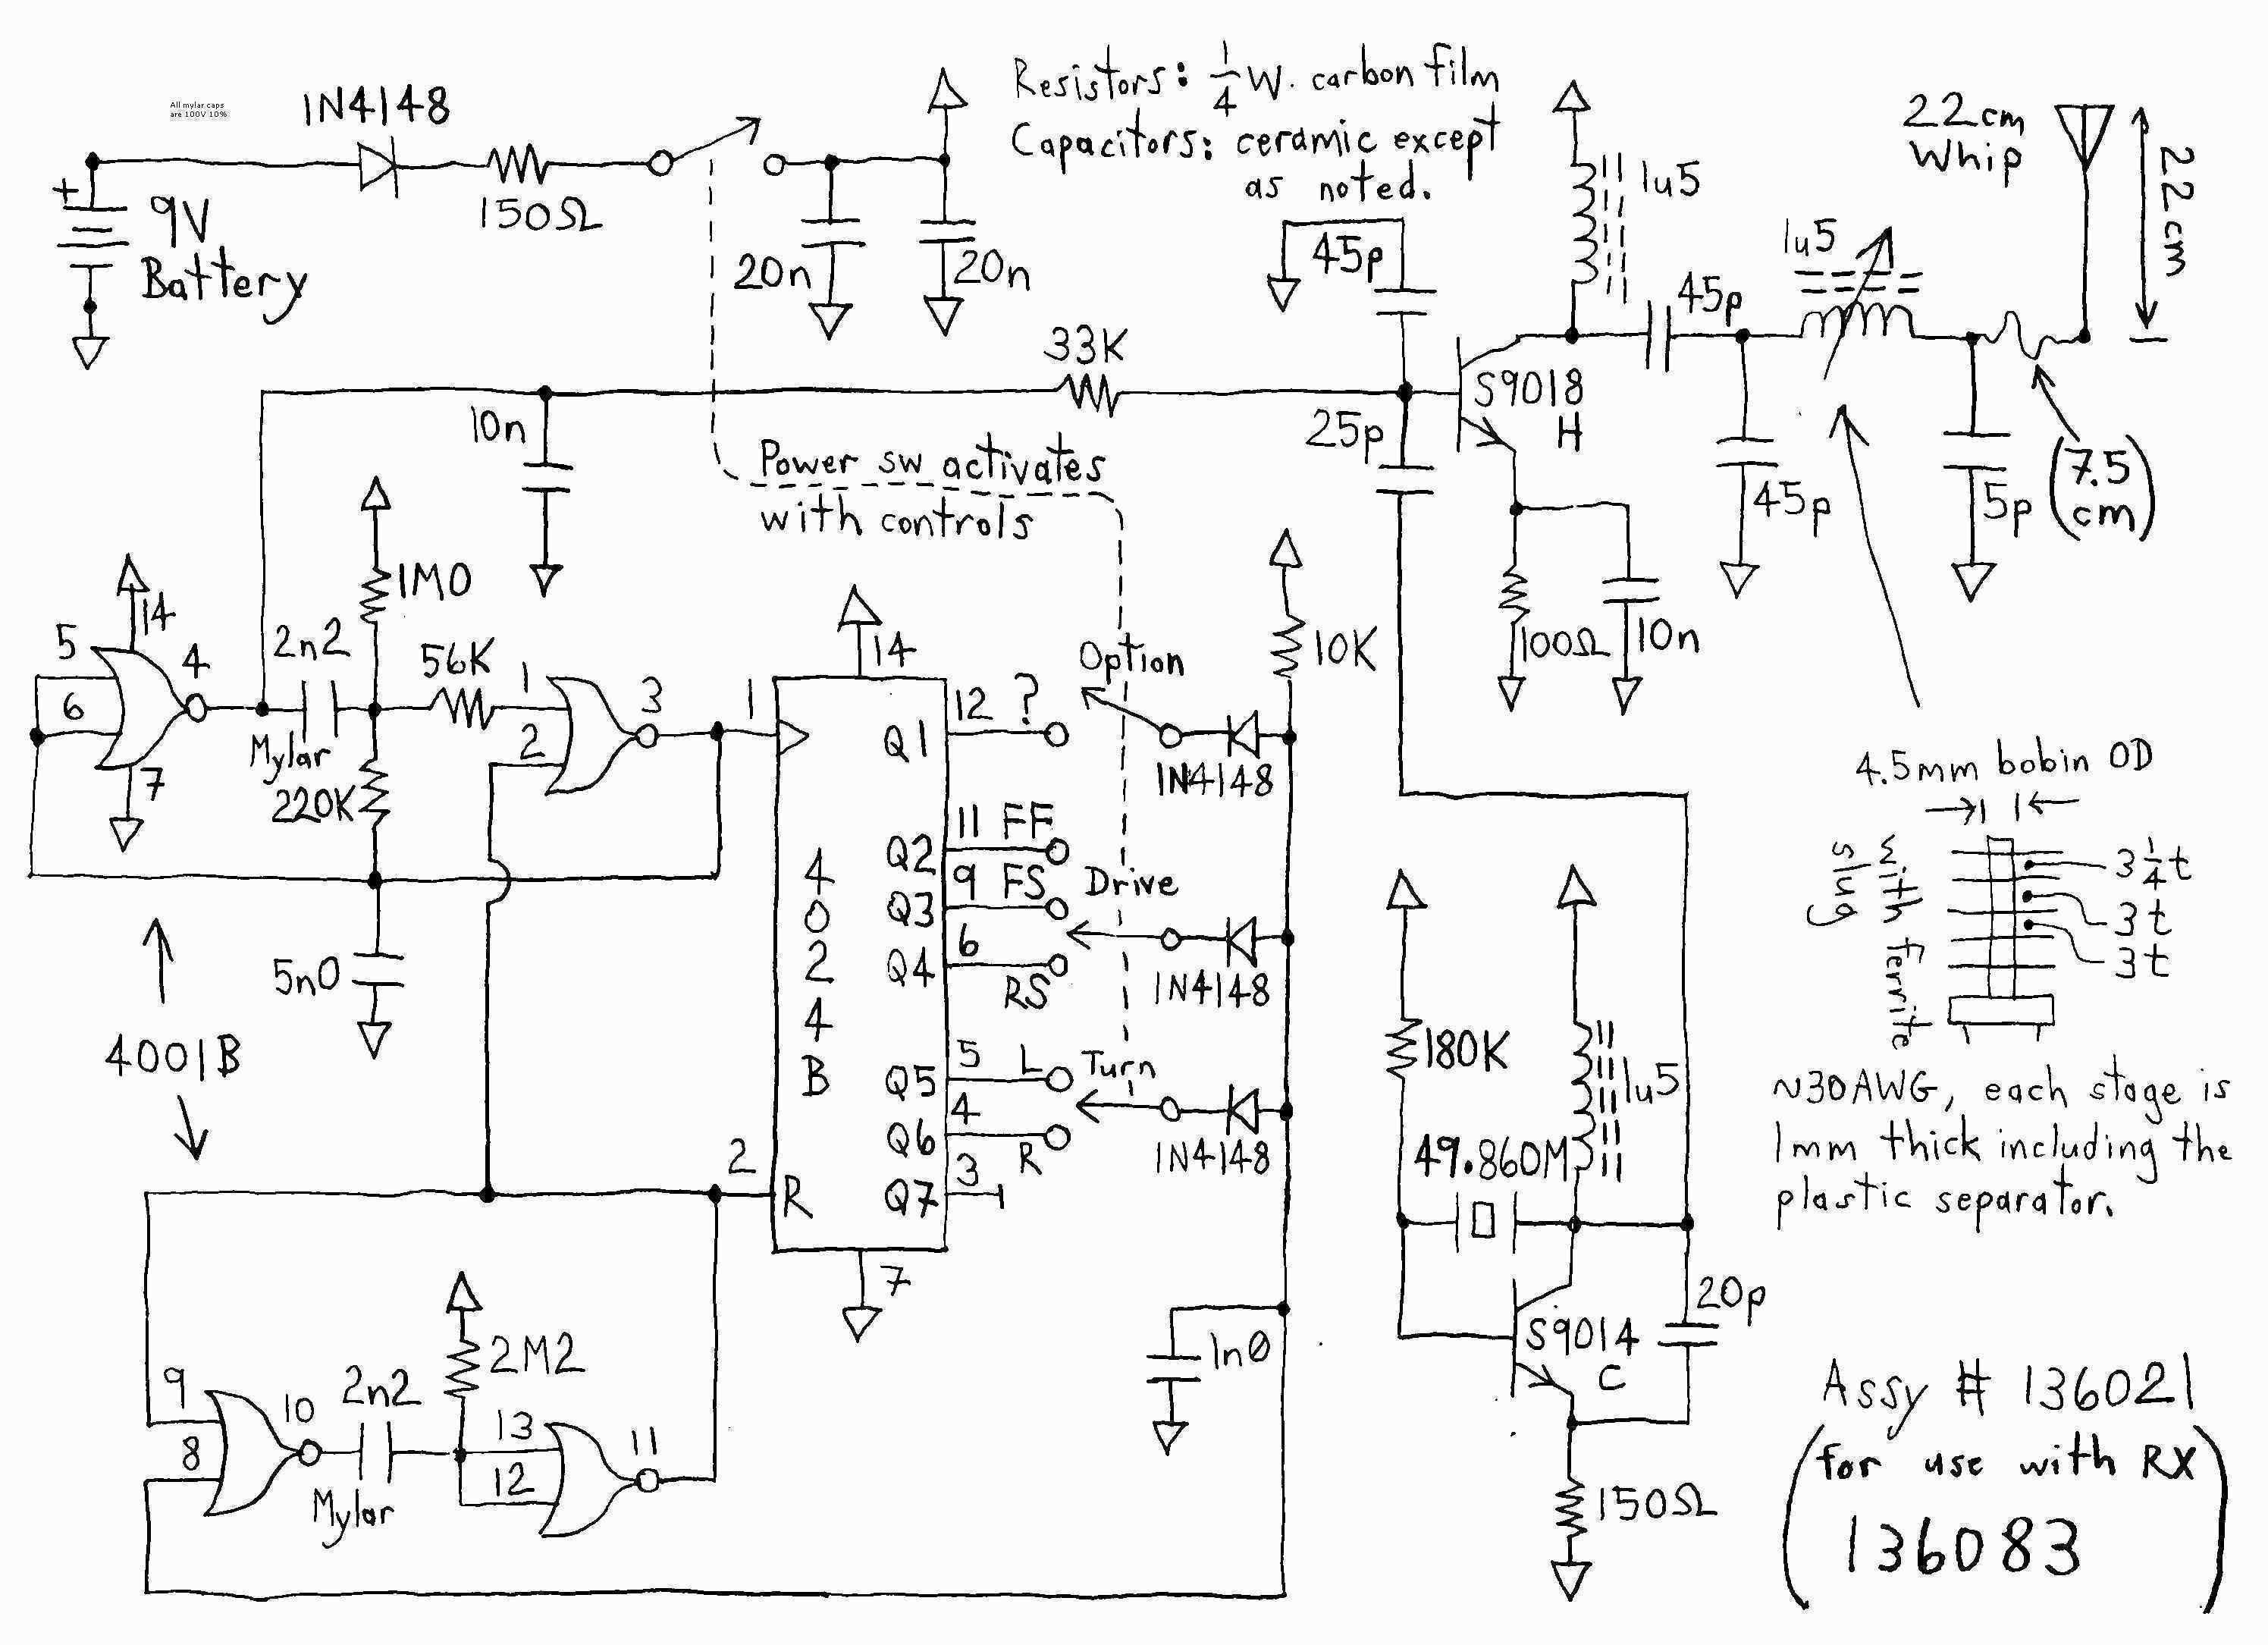 Chemical Engineering Process Flow Diagram Chemical Process Flow Diagram Symbols – Engineering Diagram Symbols Of Chemical Engineering Process Flow Diagram